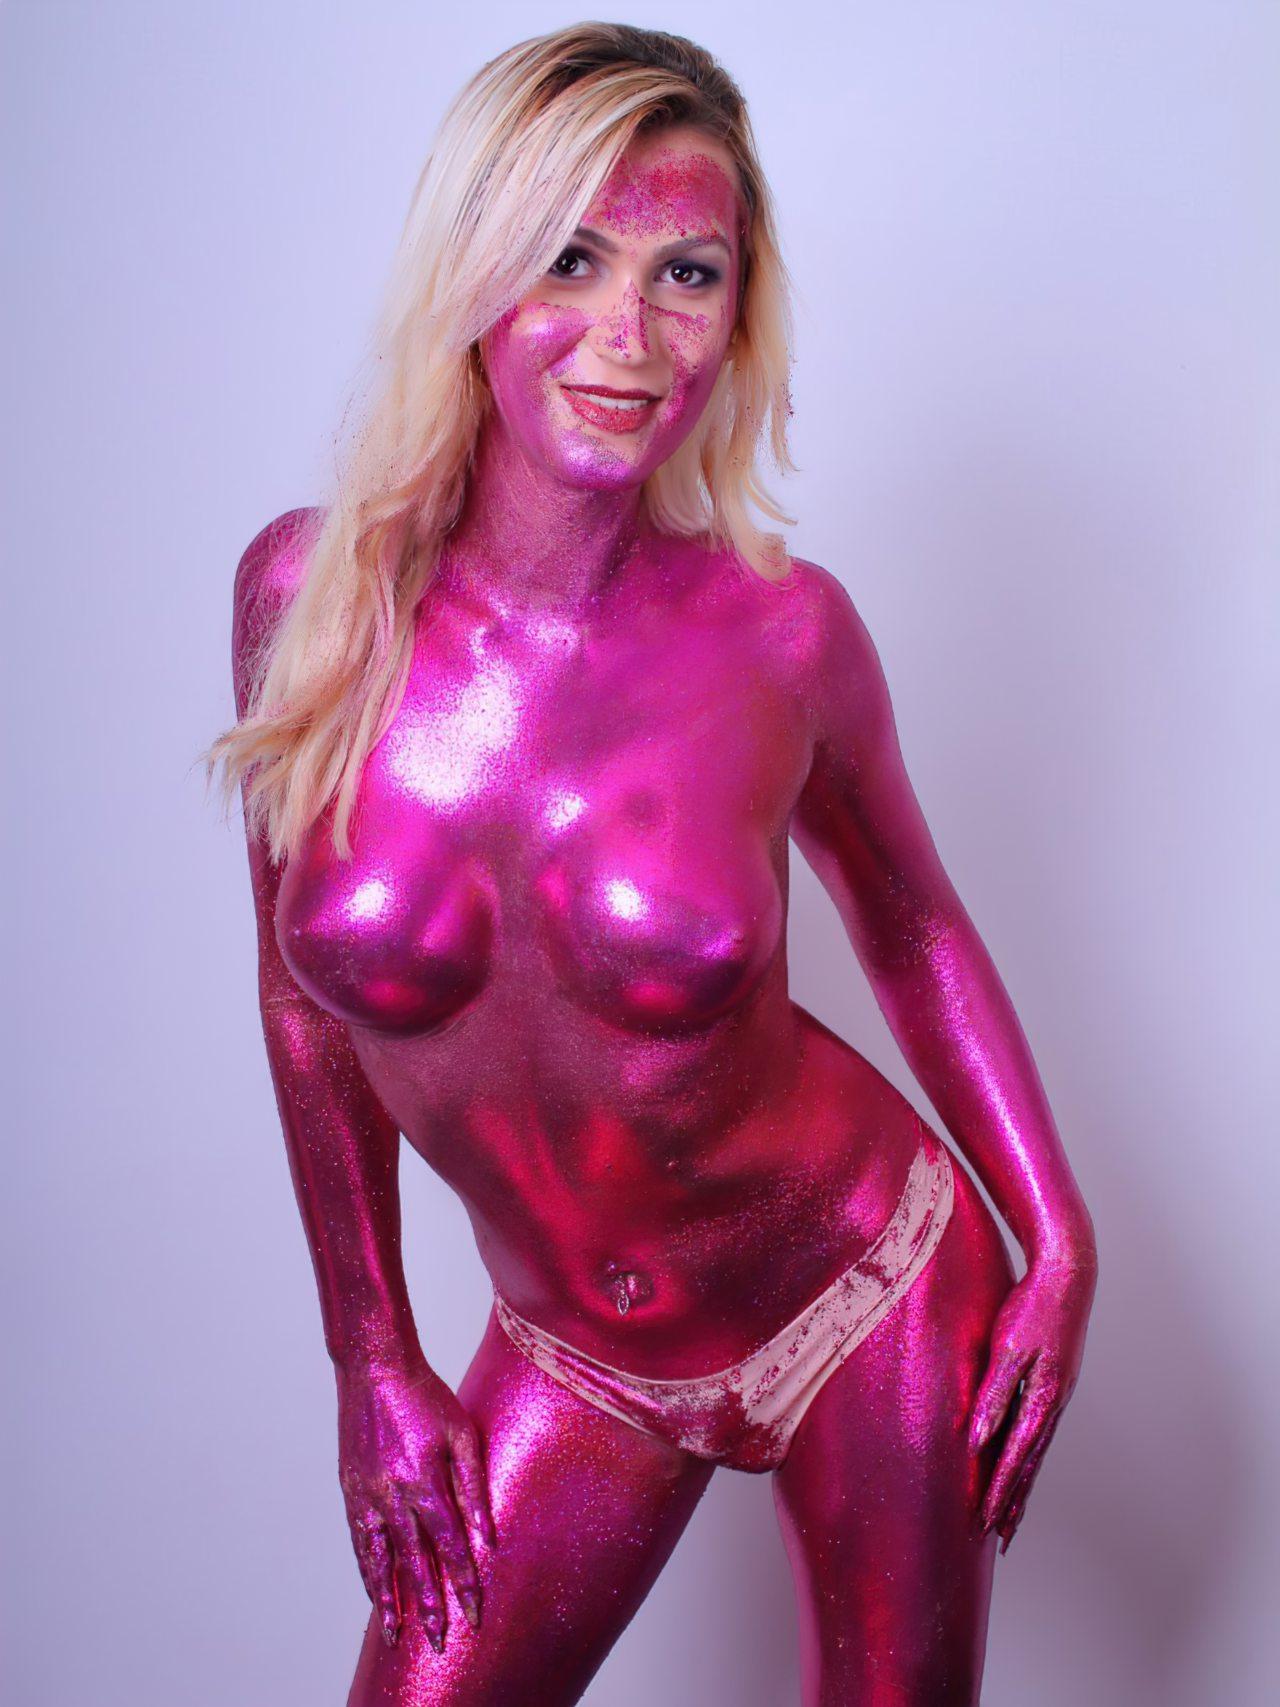 GlossyDiamondX Transex Nicole (56)